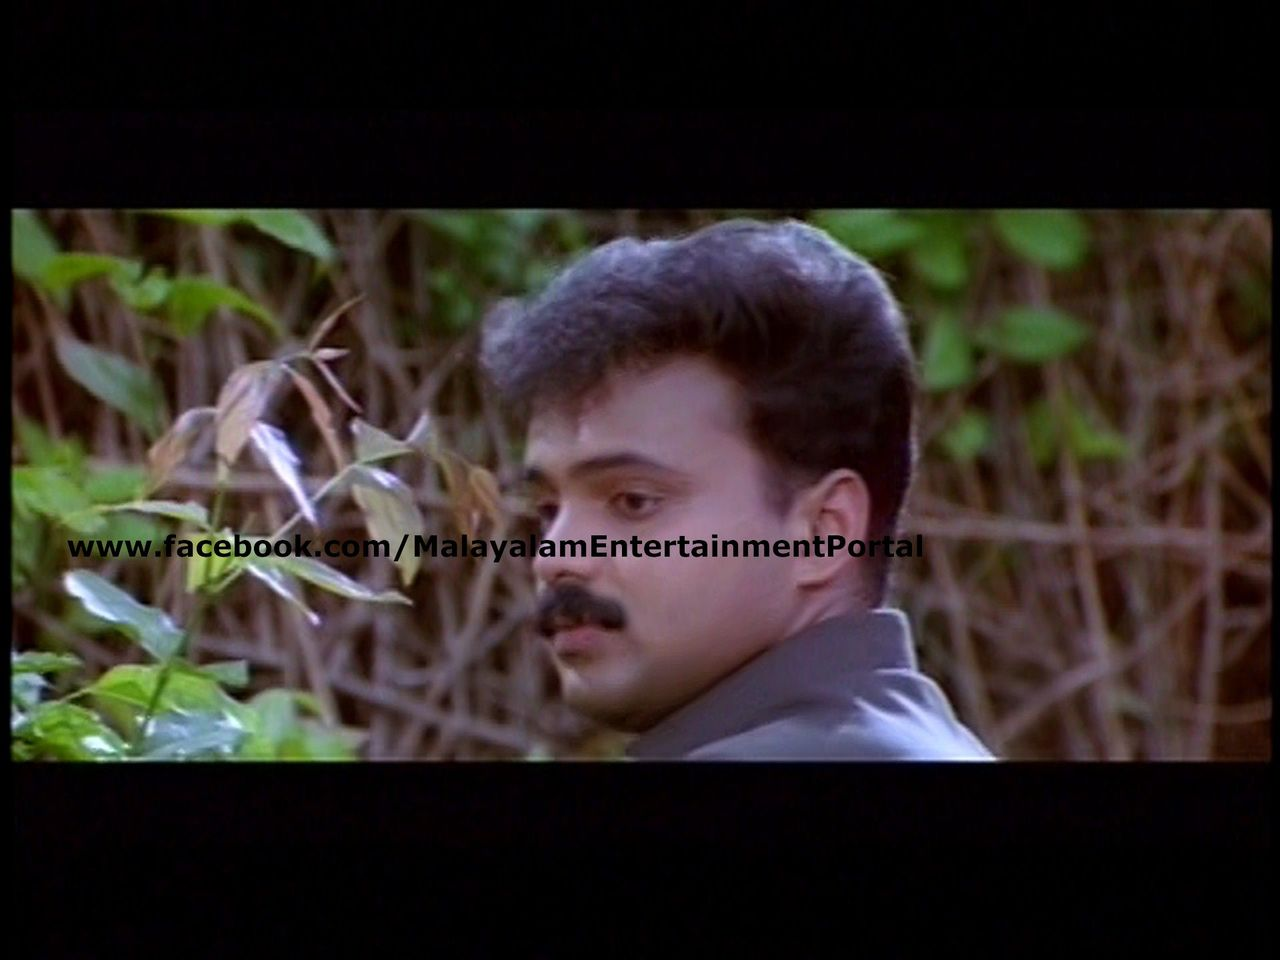 Narendran Makan Jayakanthan Vaka DVD Screenshots (Saina) Bscap0008